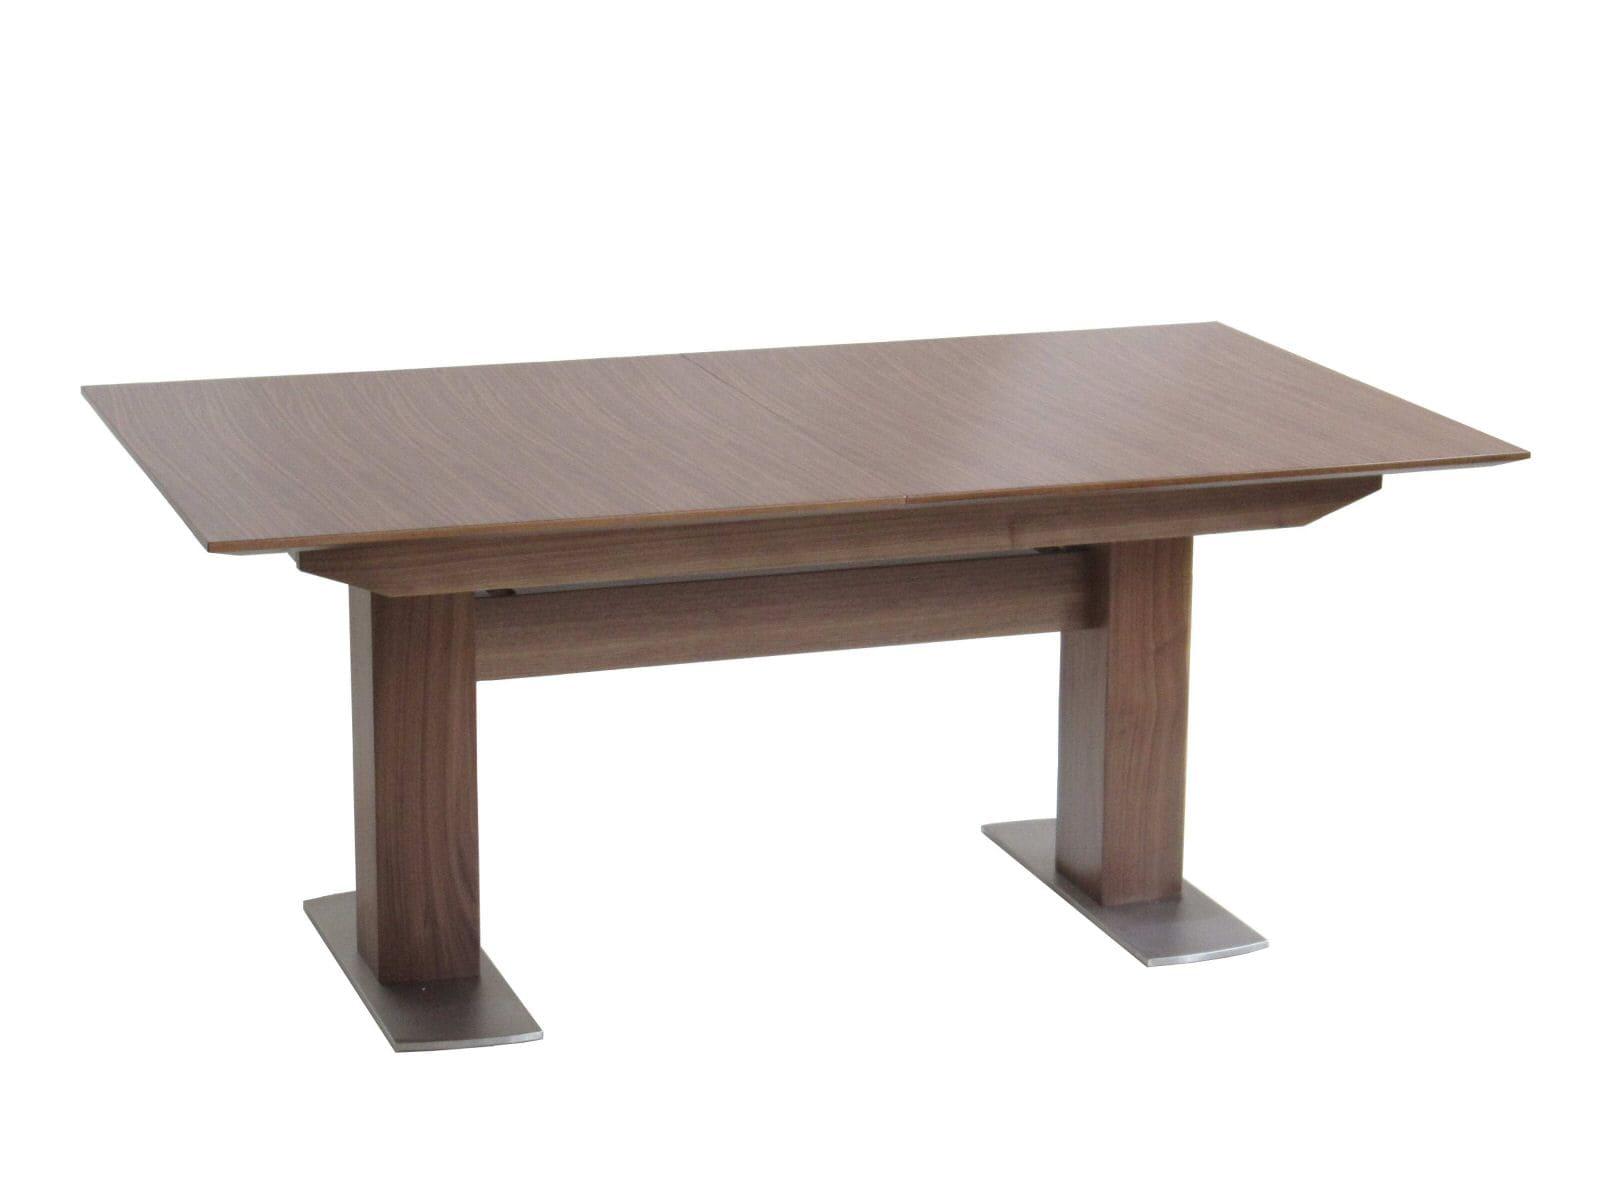 Murales stol 6601-2md-ika